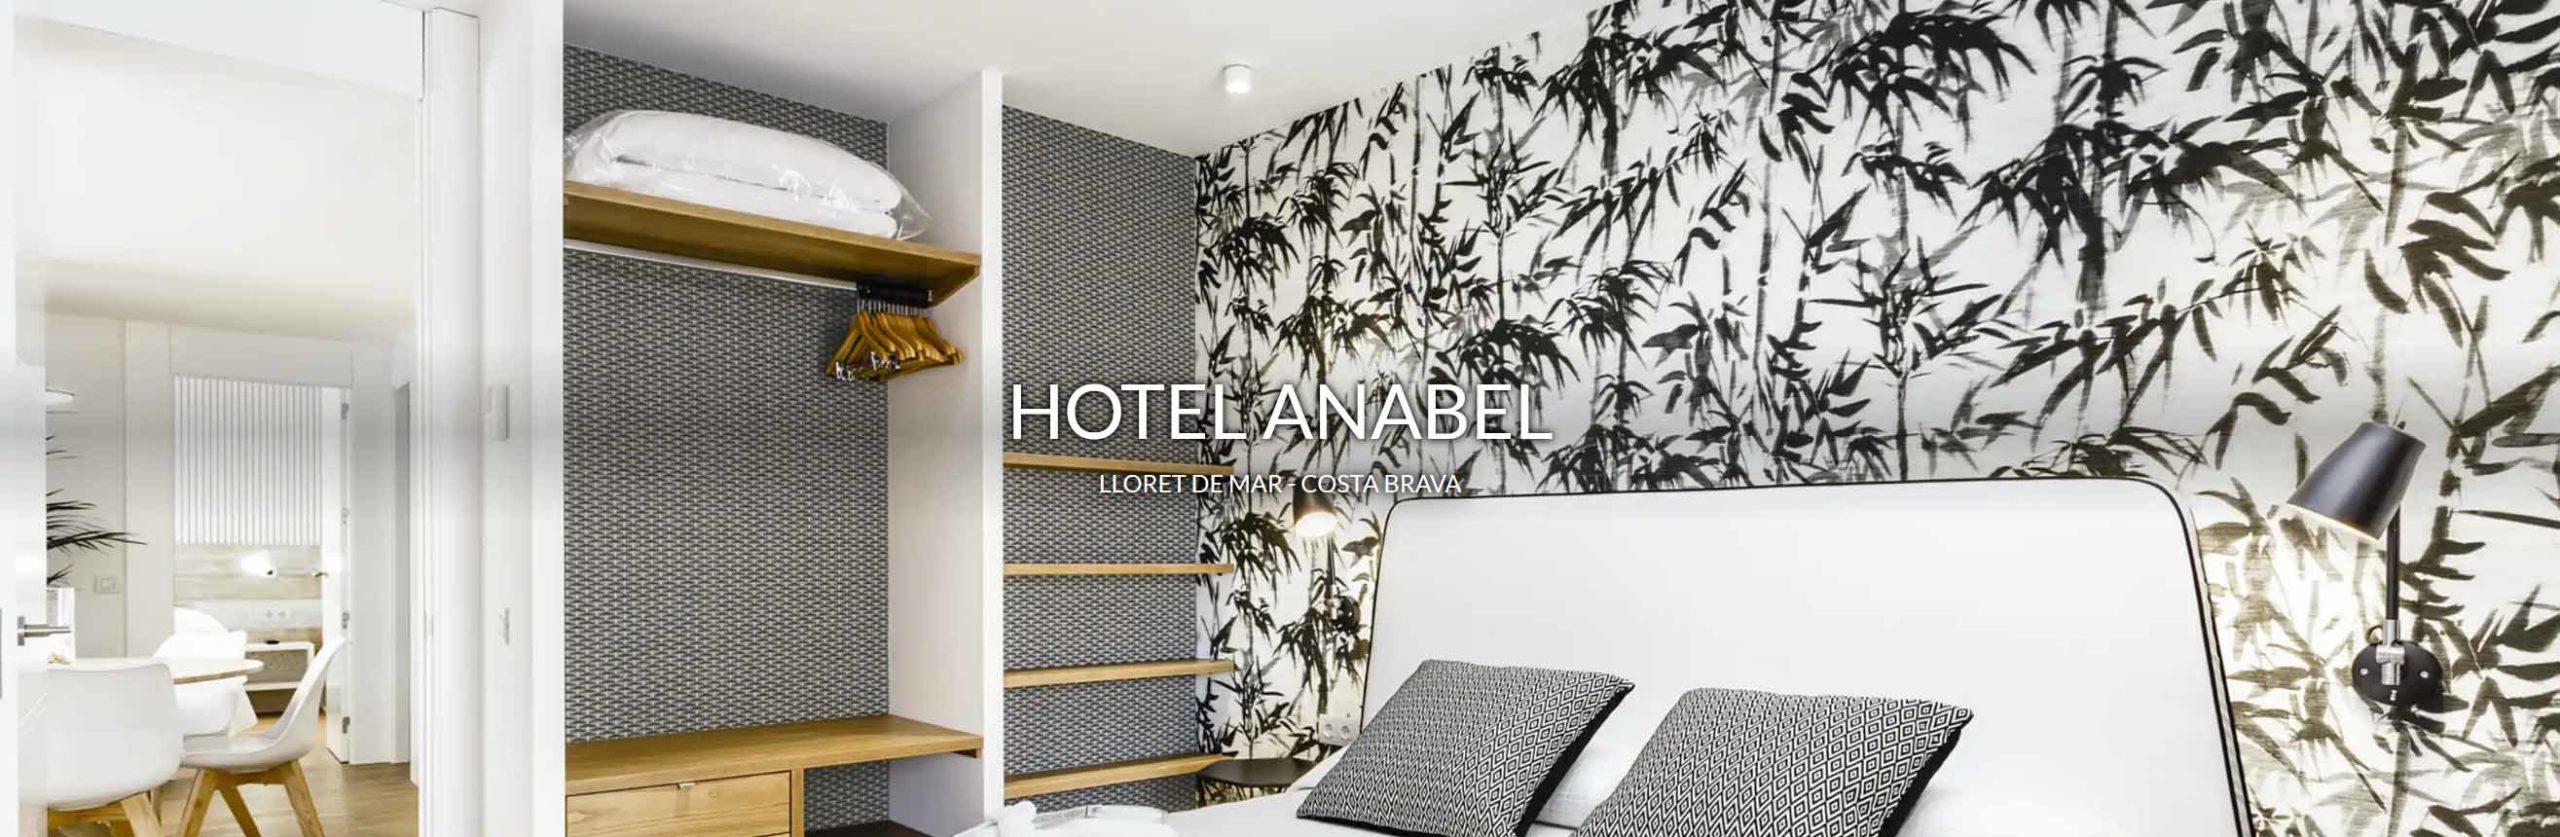 hotel-anna7